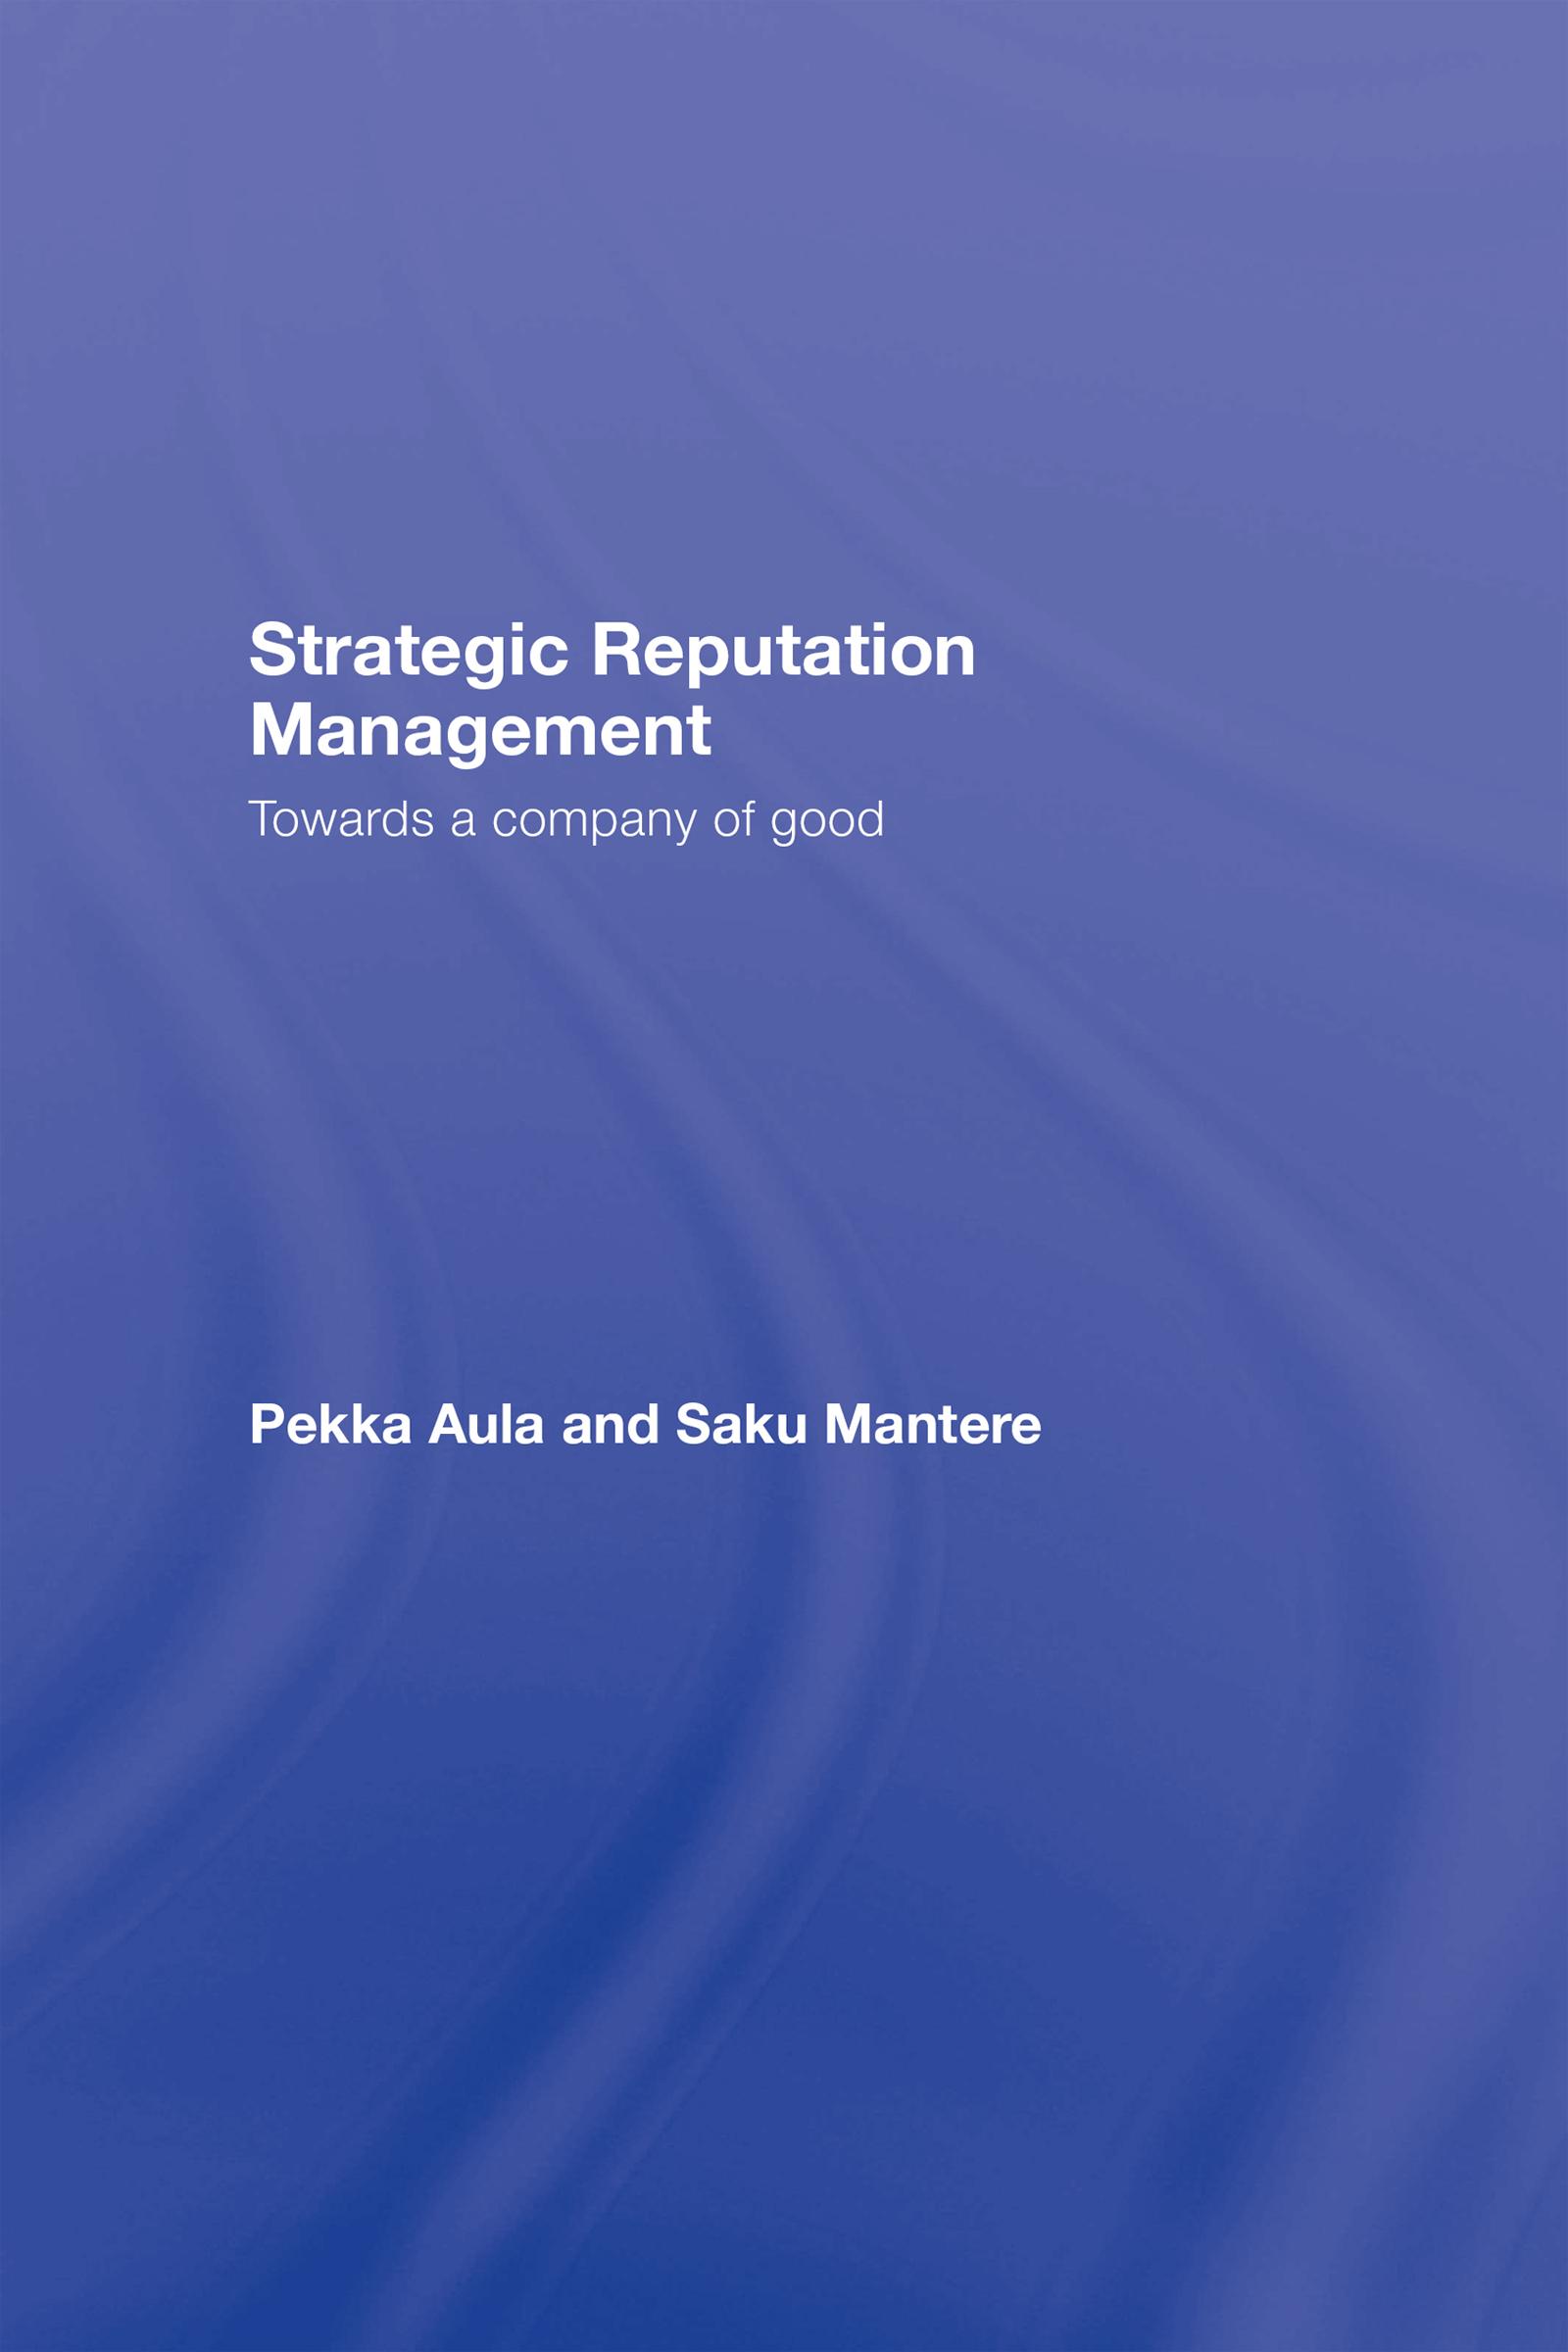 Strategic Reputation Management